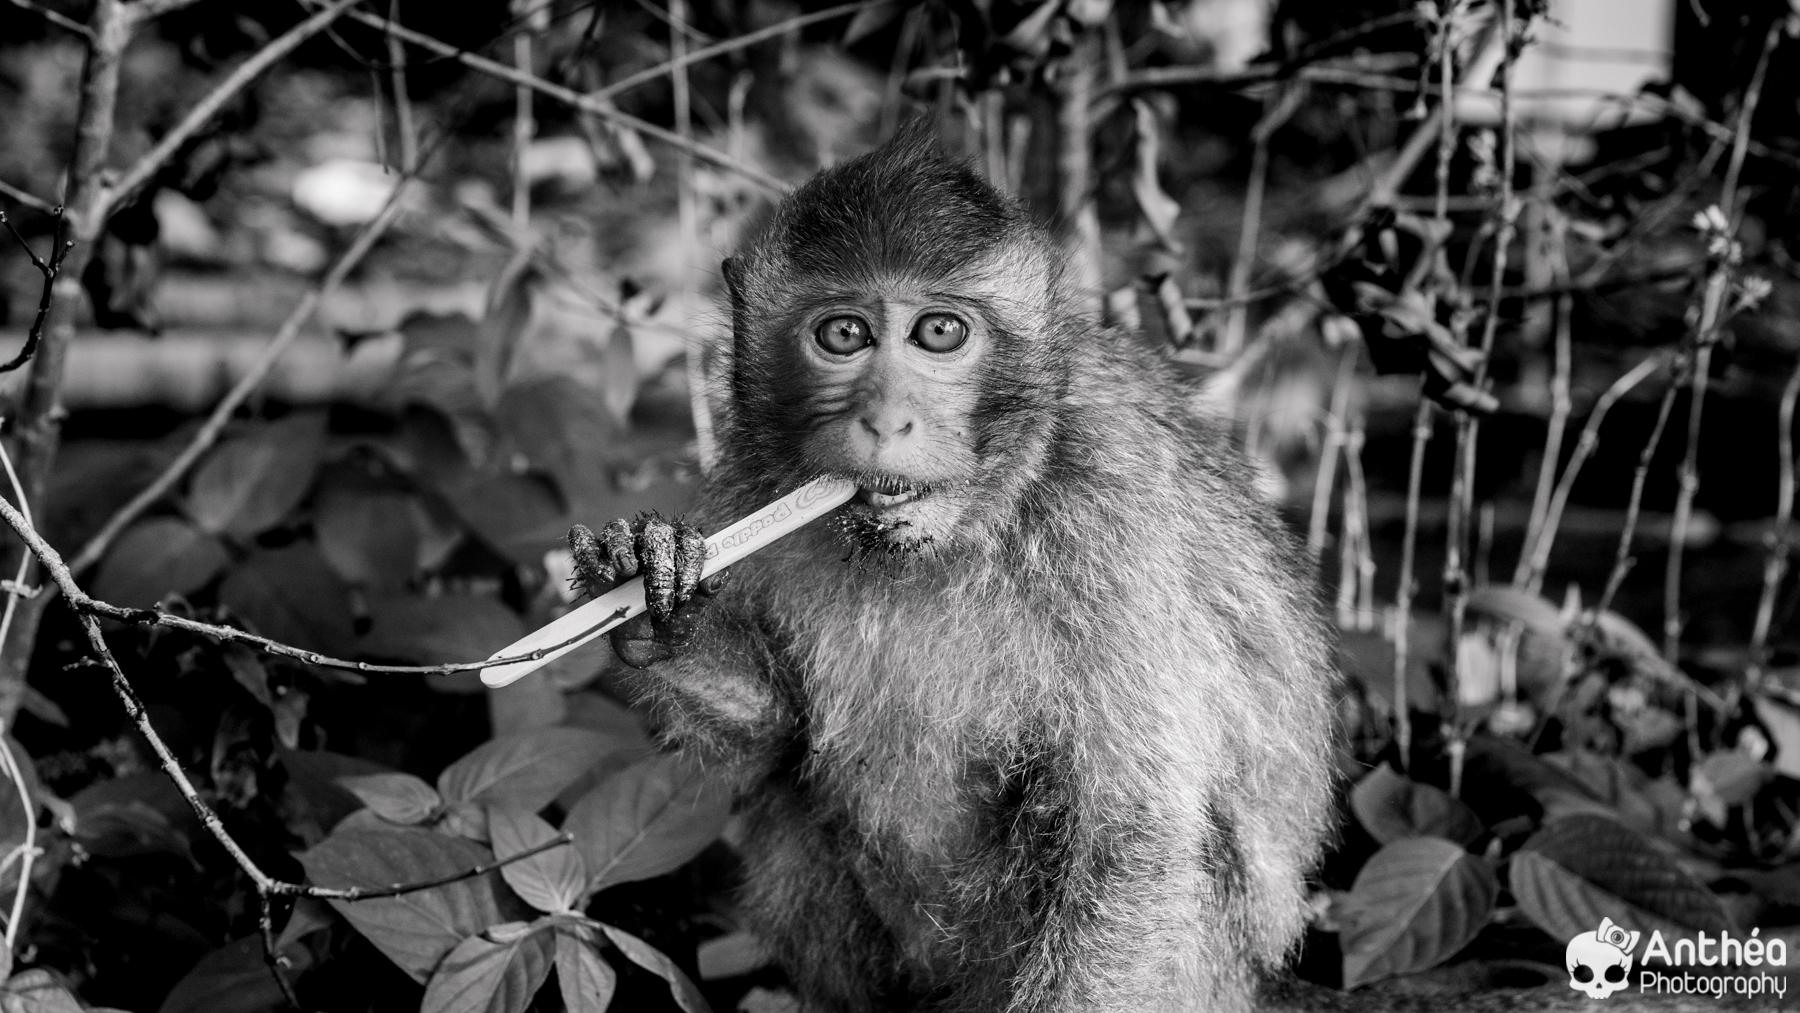 Thaïlande - Thailand - Singes - Monkey